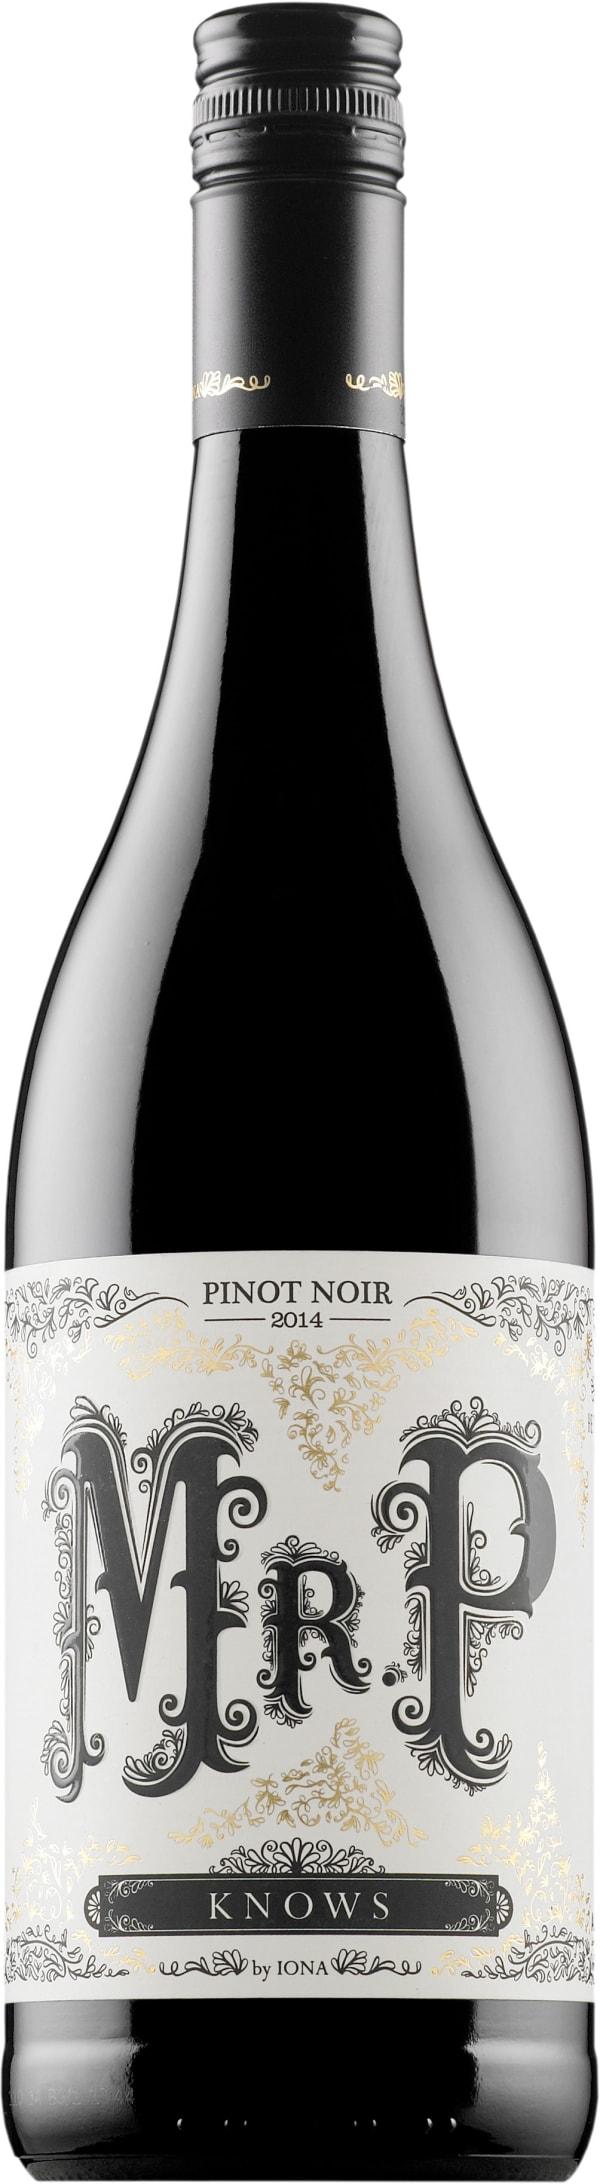 Iona Mr P Pinot Noir 2016